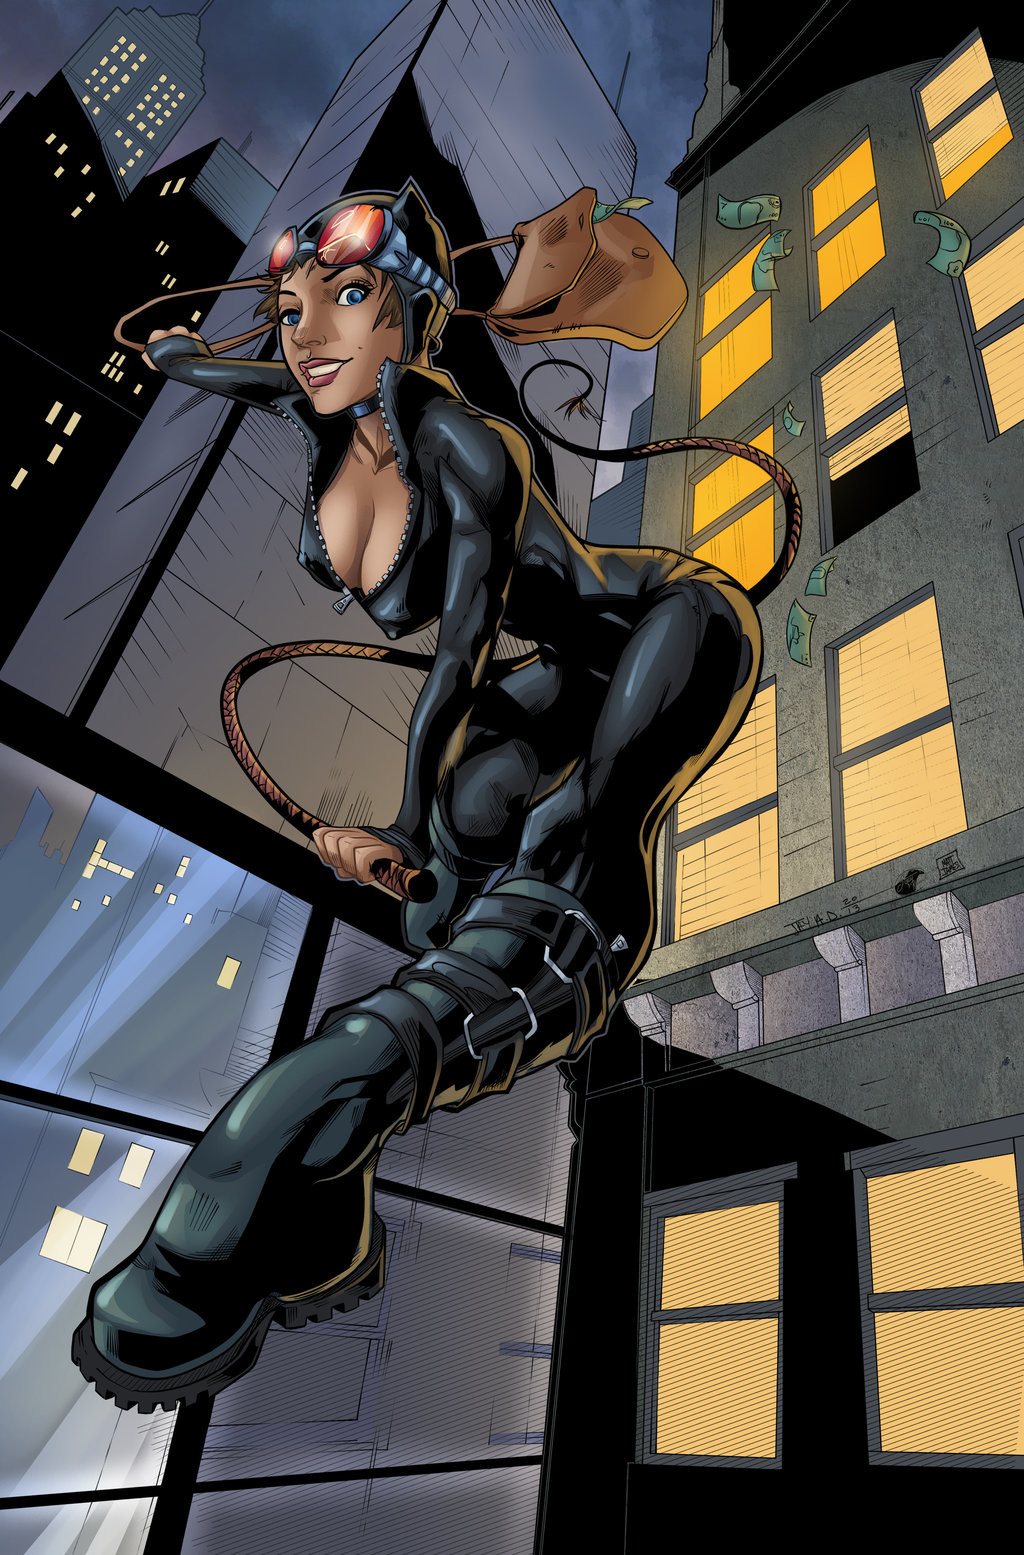 Matt james catwoman gotham city s finest by snakebitartstudio db1d6uk